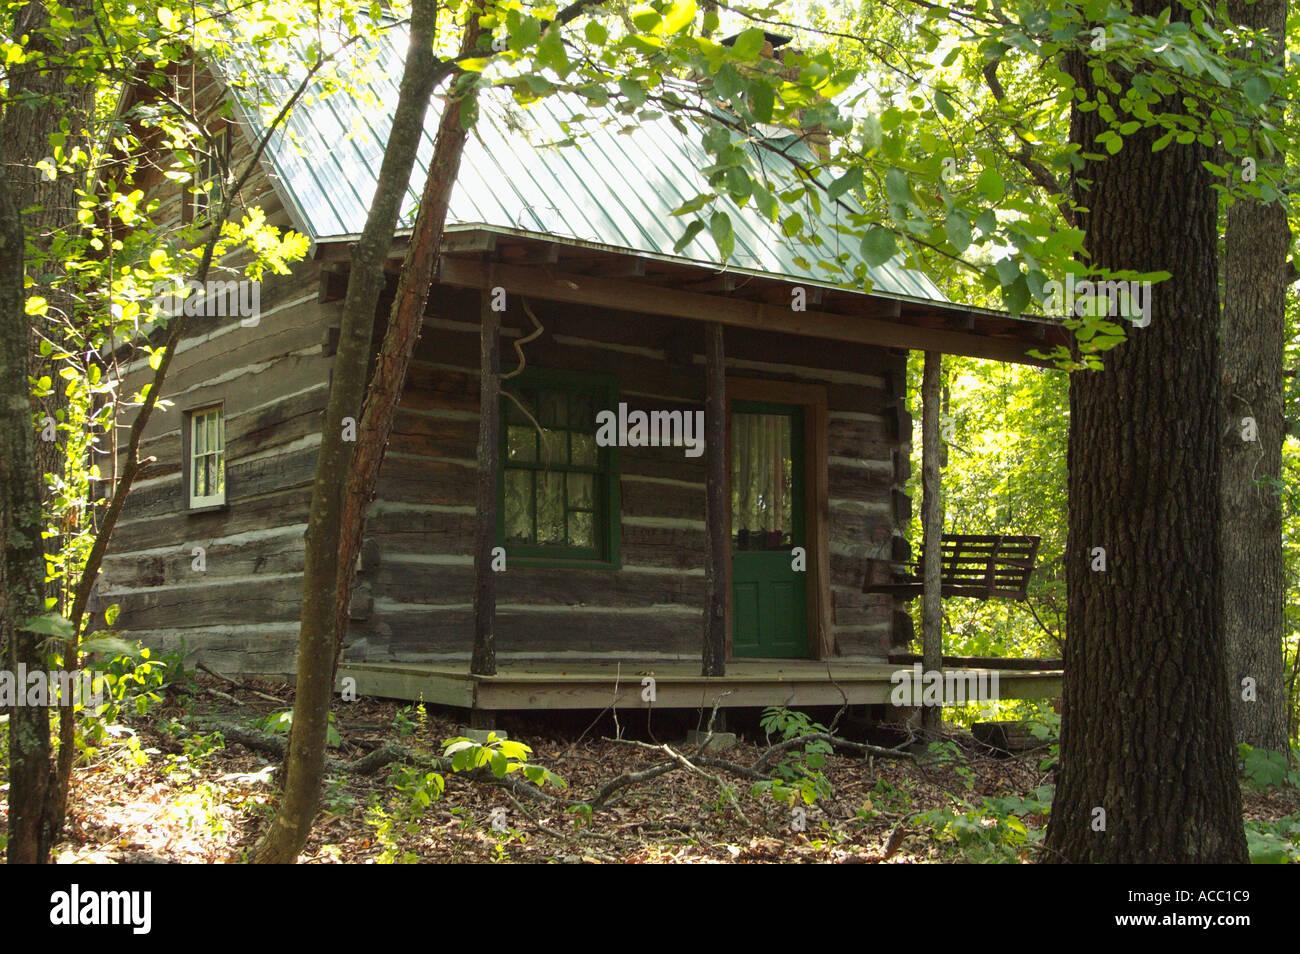 handgunsband cabin luxury cabins arkansas eureka in springs tree houses designs